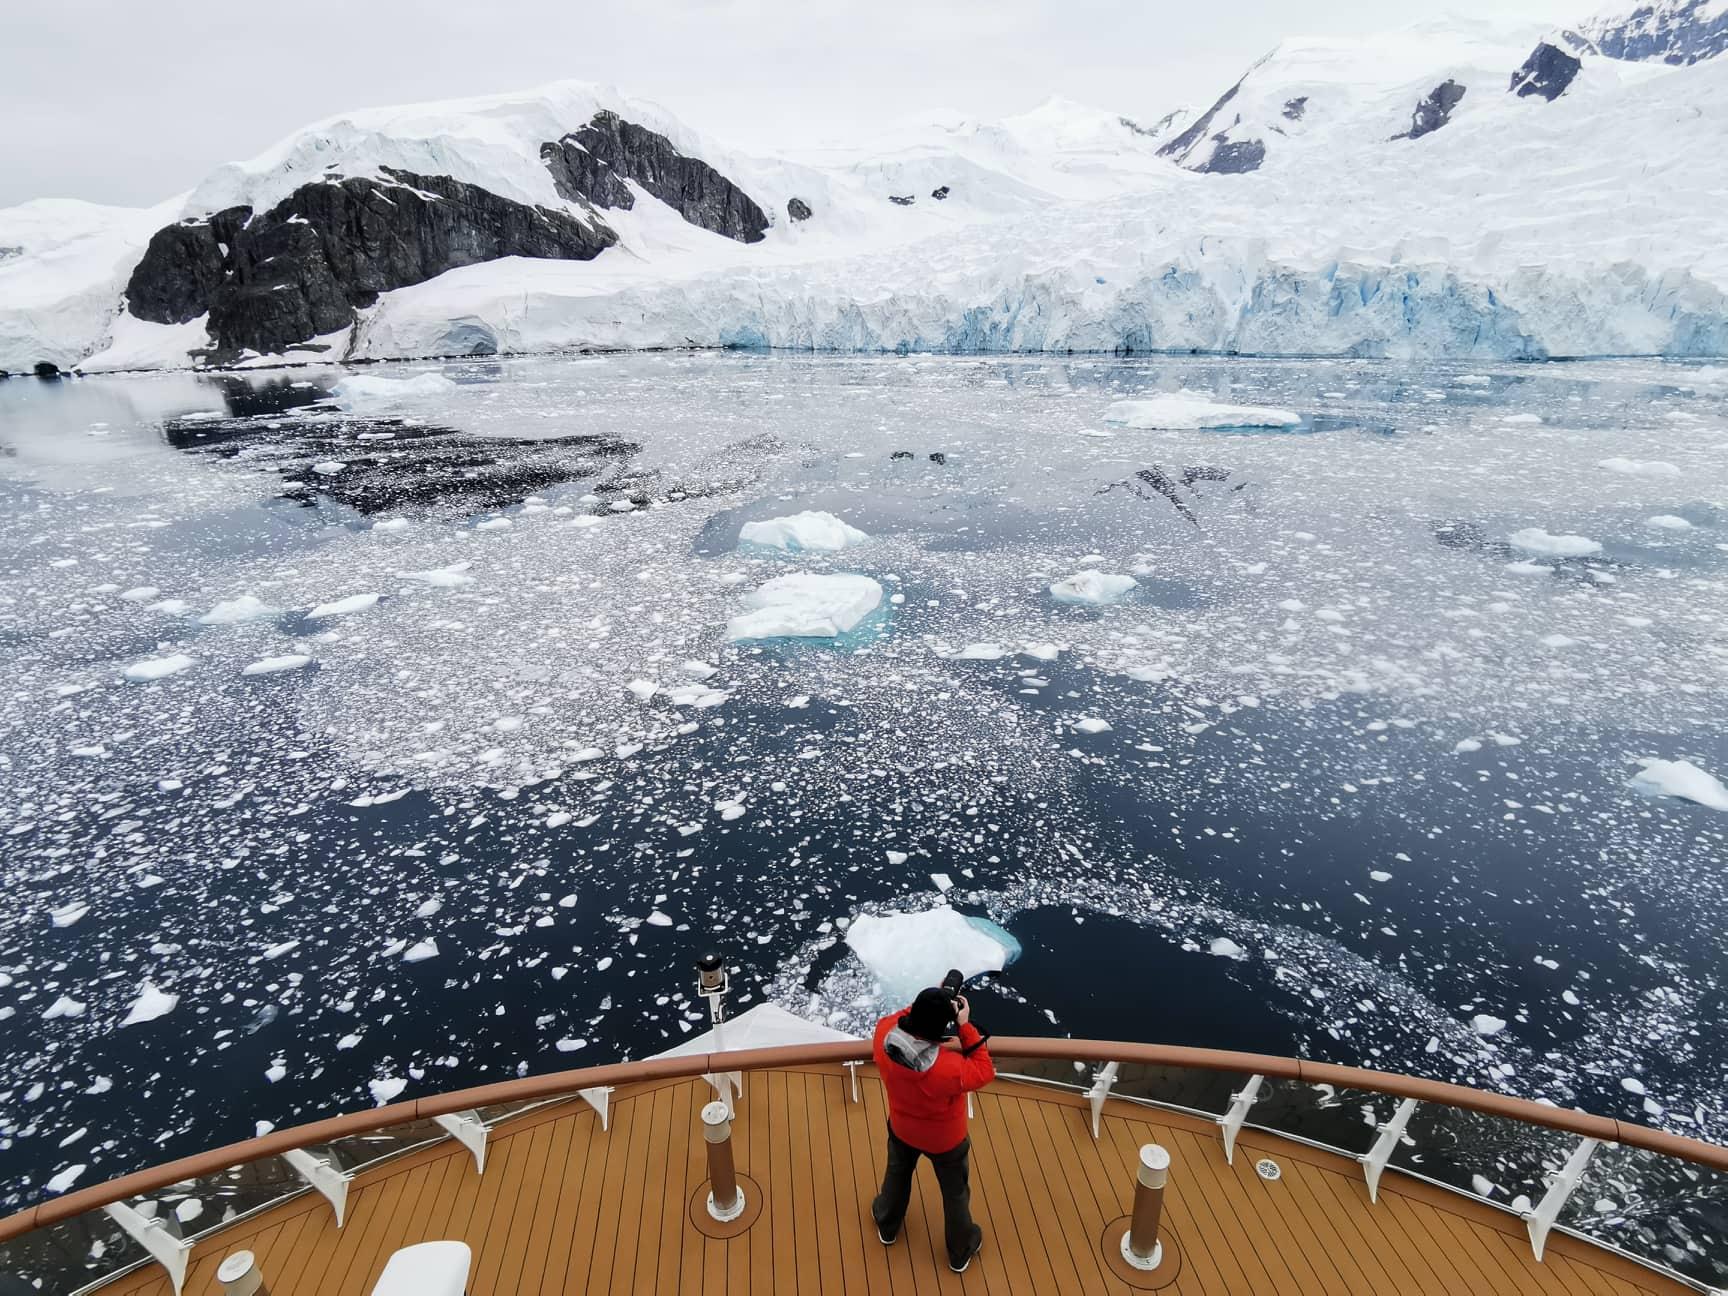 Antarctica Photography Expedition 2021 with Daniel Kordan - day 3